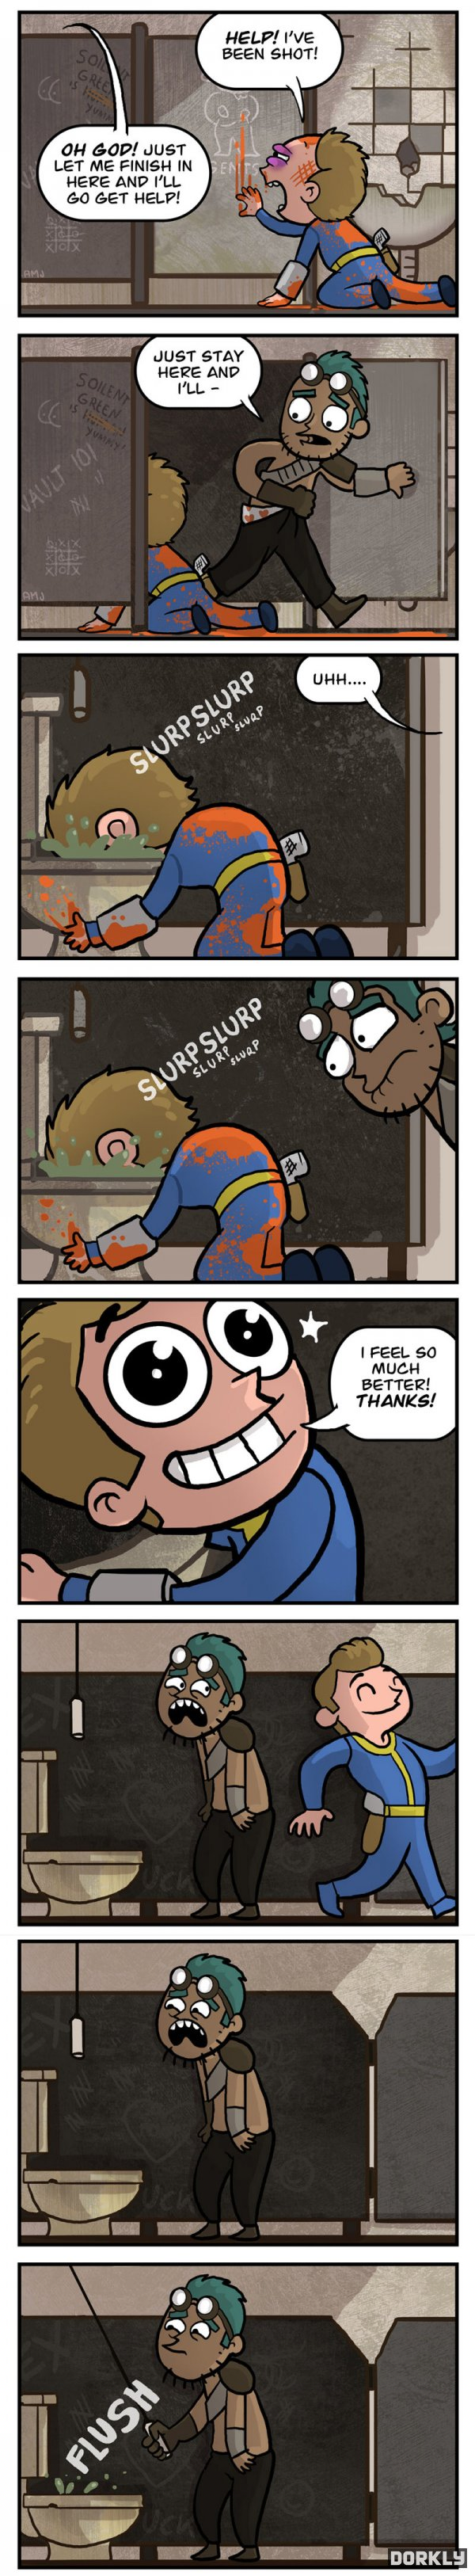 Fallout Bathroom Break Video Game Logic Know Your Meme